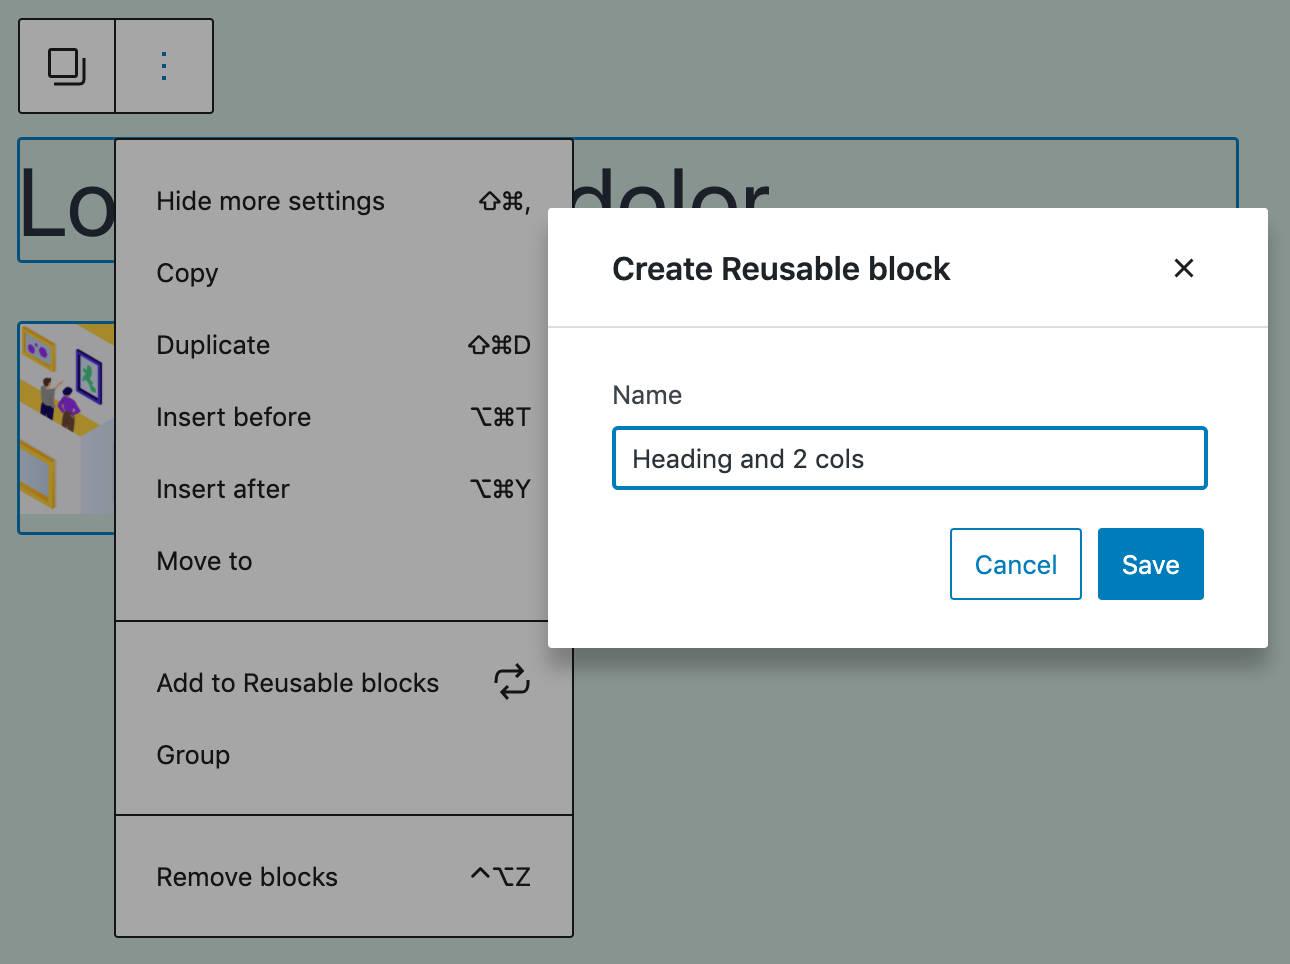 A modal for the reusable blocks creation flow.